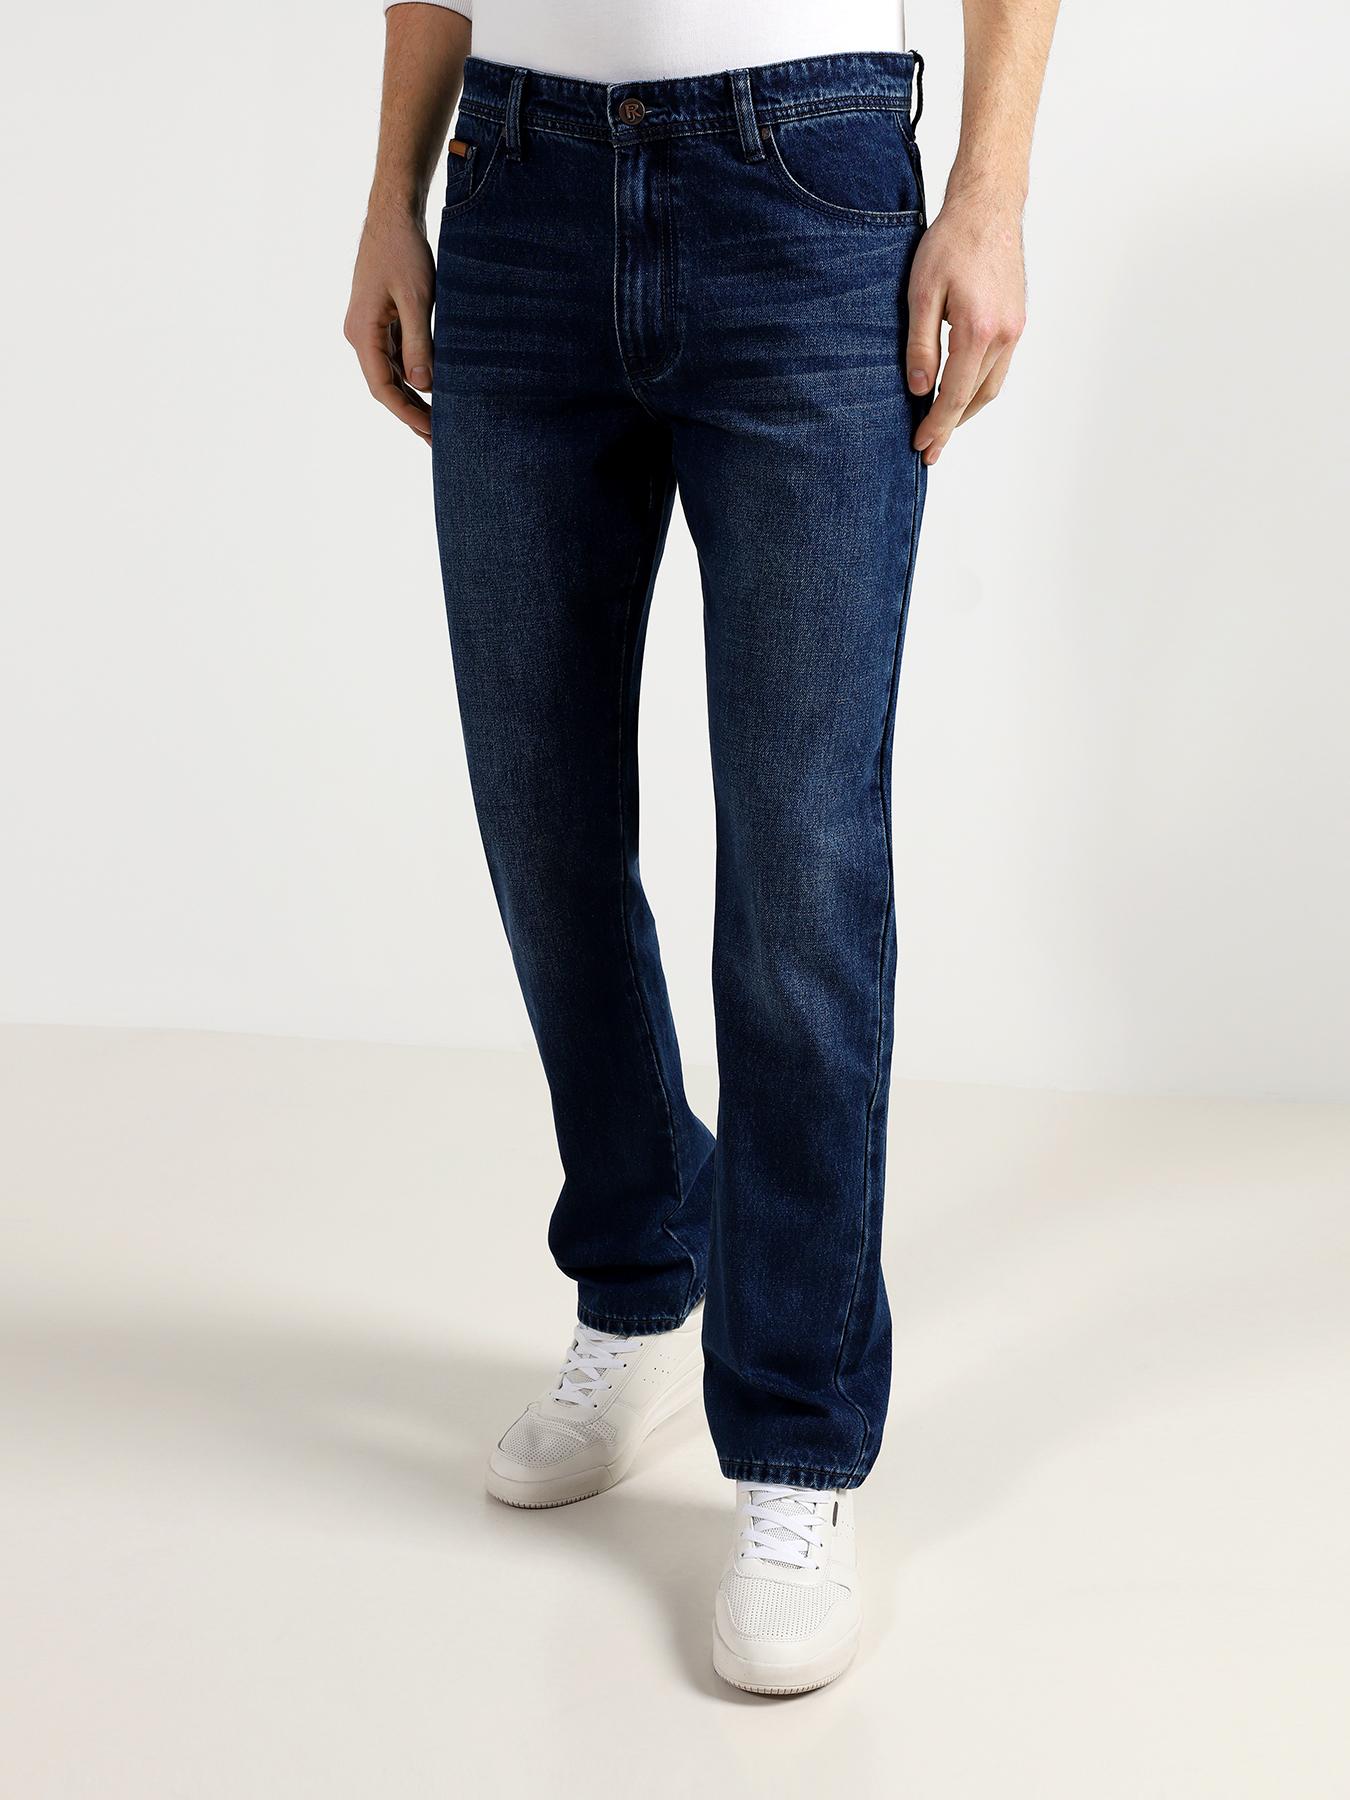 Ritter Jeans Джинсы